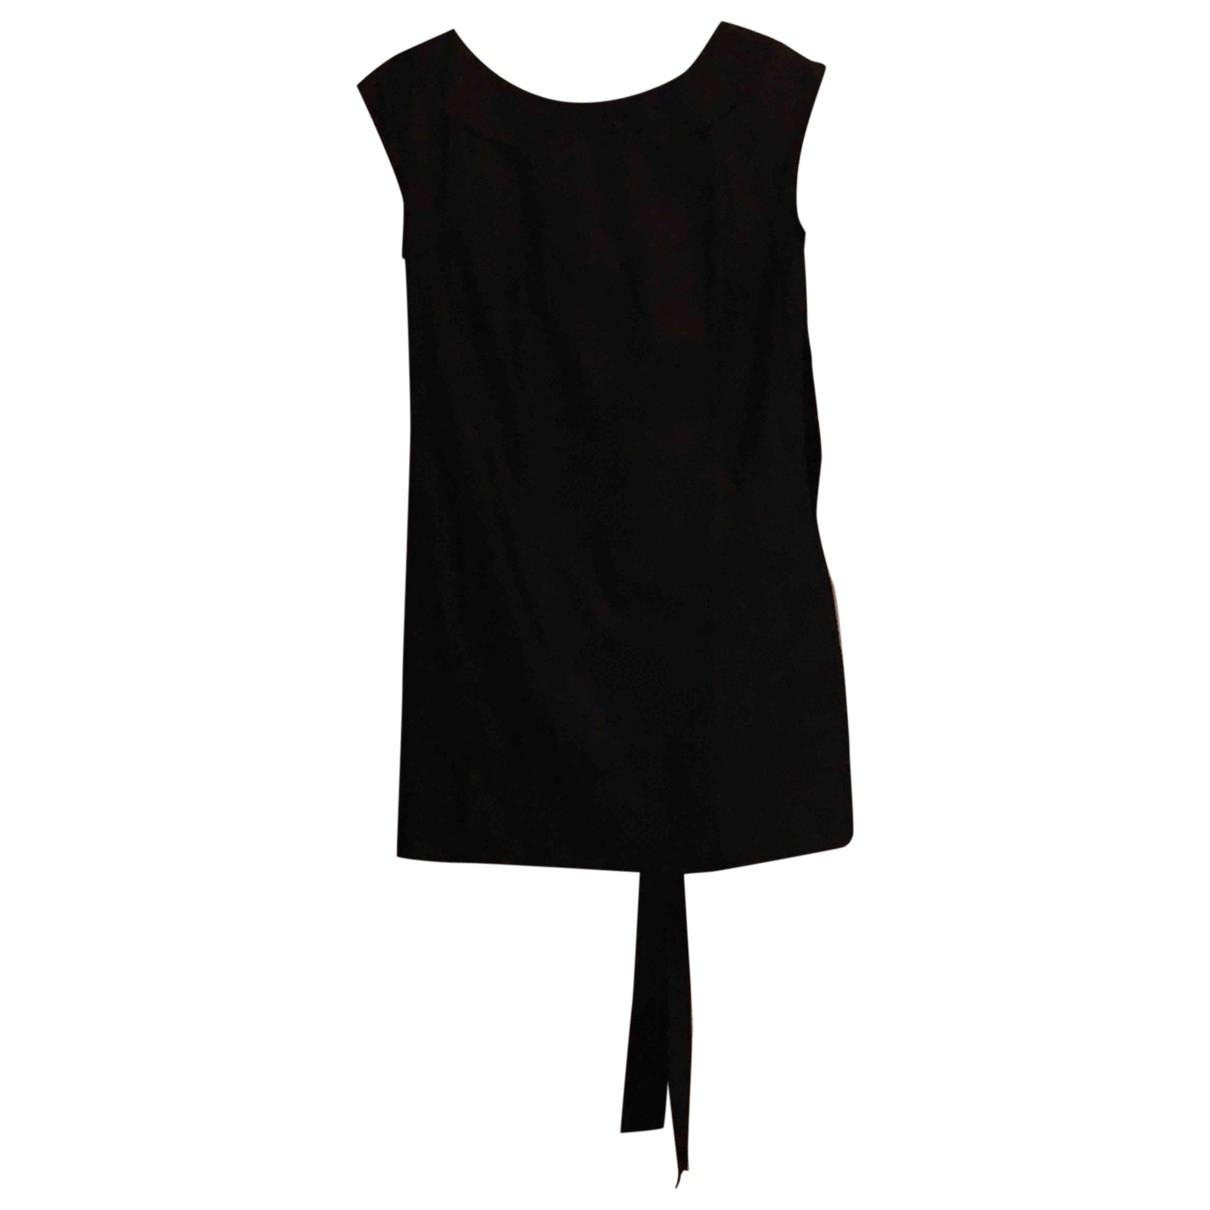 Dkny \N Black dress for Women 4 US